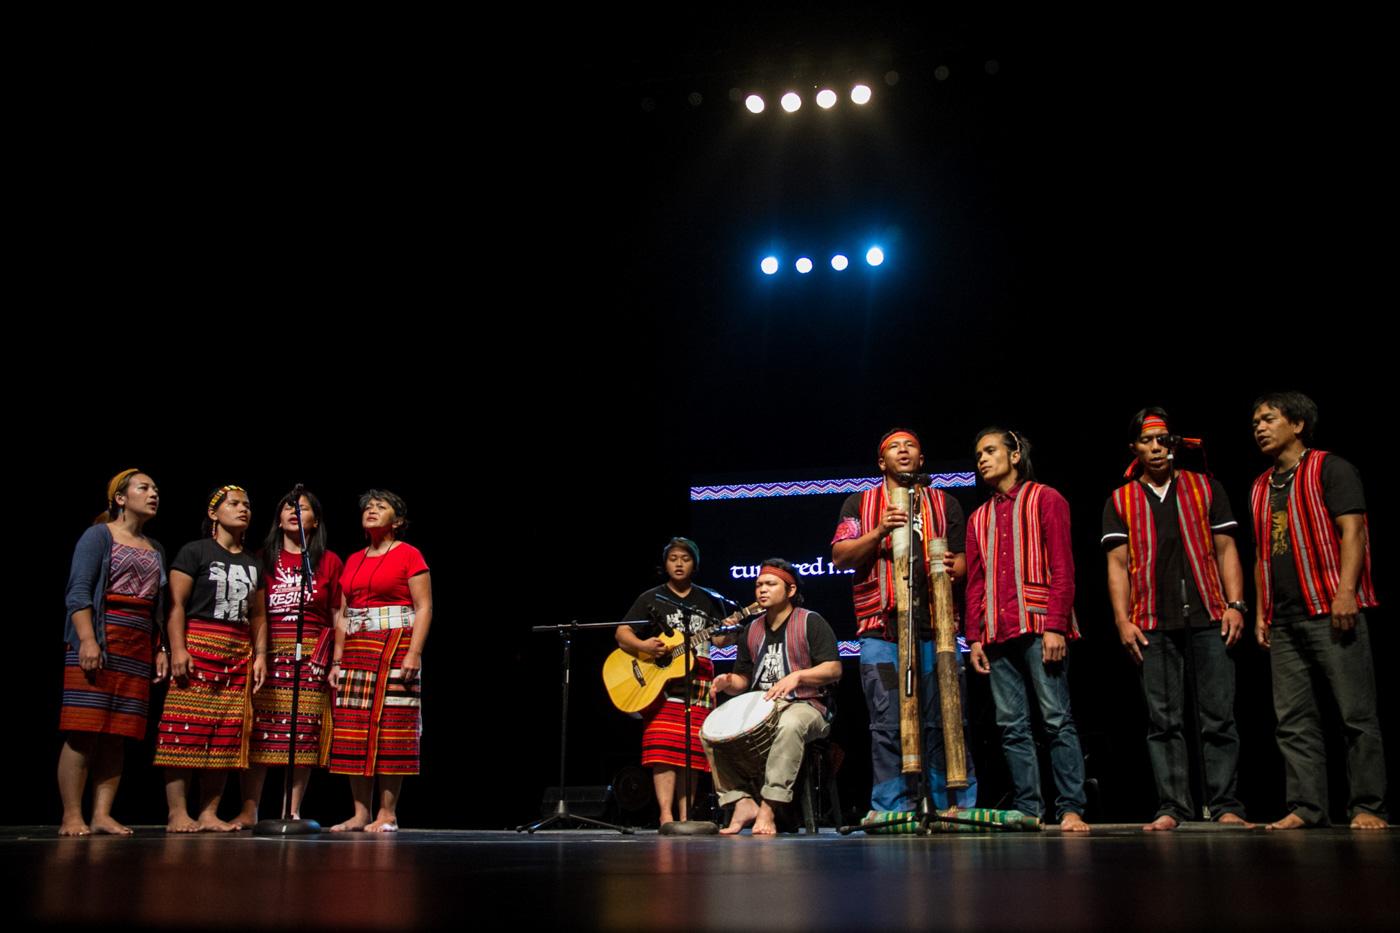 DIVERSE. Members of the Dap-ayan ti Kultura iti Kordilyera (DKK) sing Salidummay songs during the Hugpungan 2017 in UP theater on September 18, 2017. Photo by Mark Saludes